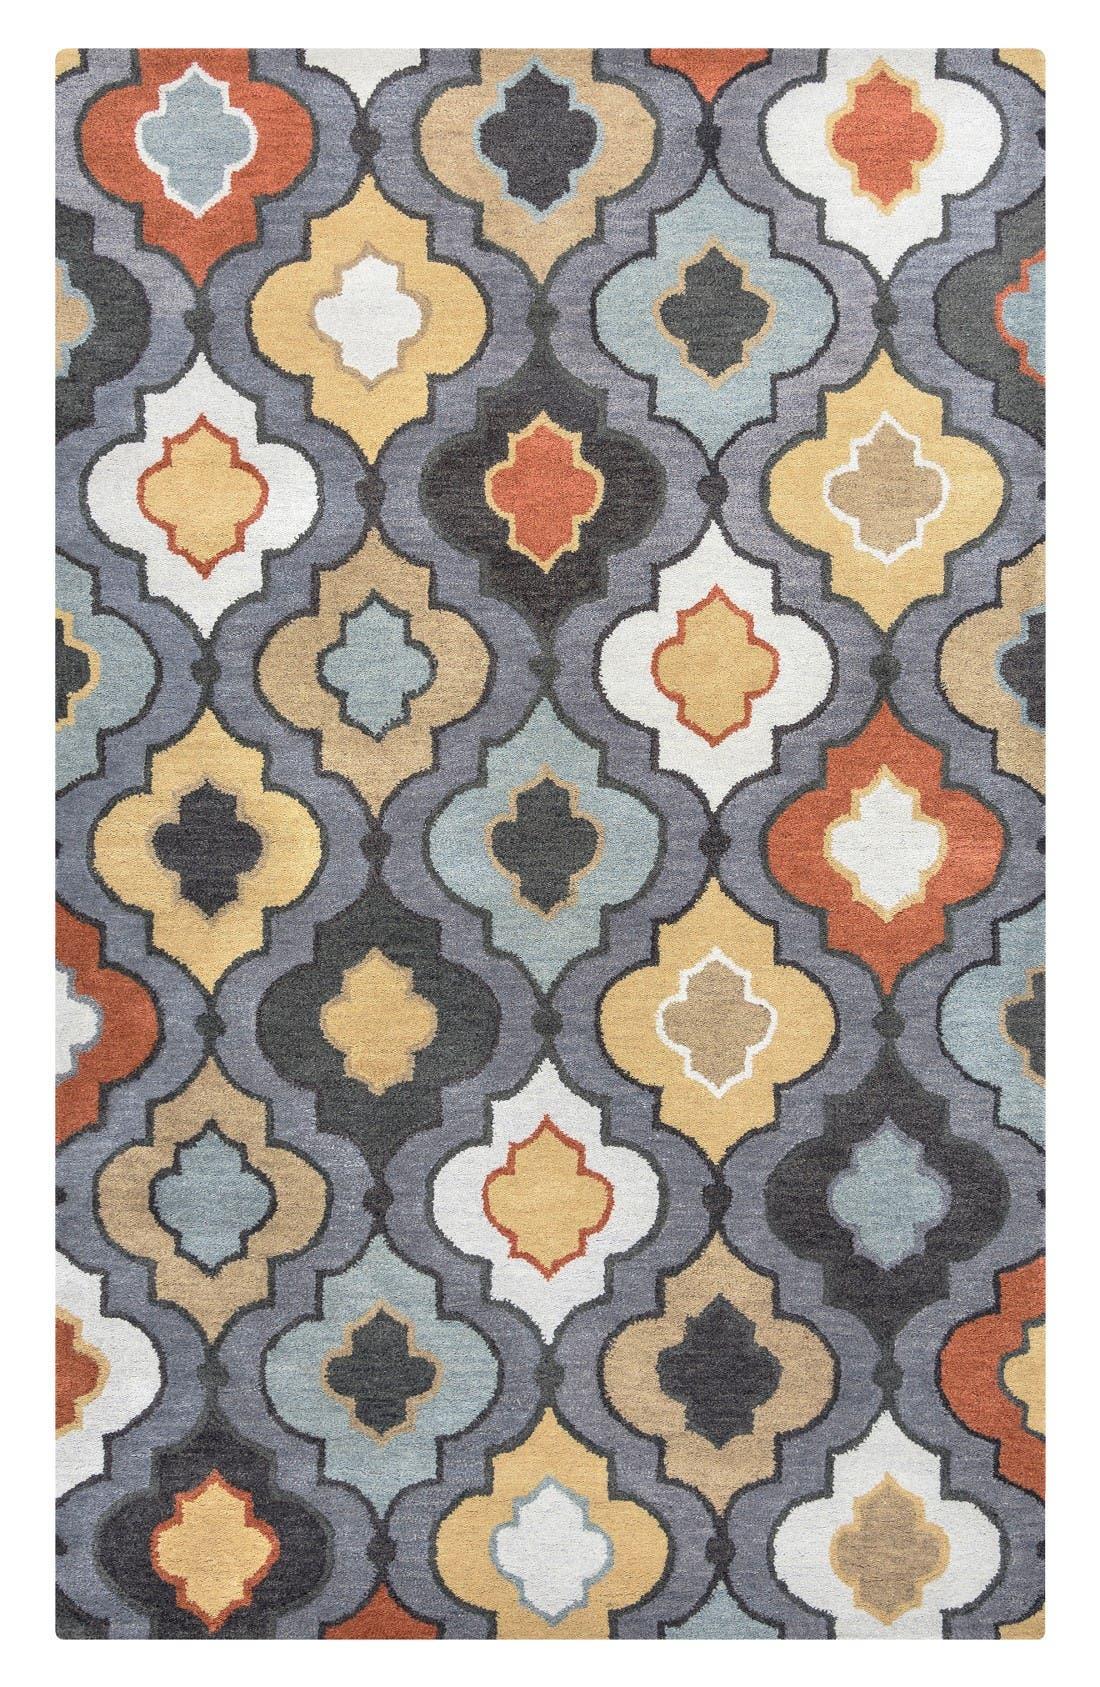 'Quatrefoil' Hand Tufted Wool Area Rug,                         Main,                         color, Grey/ Orange/ Gold